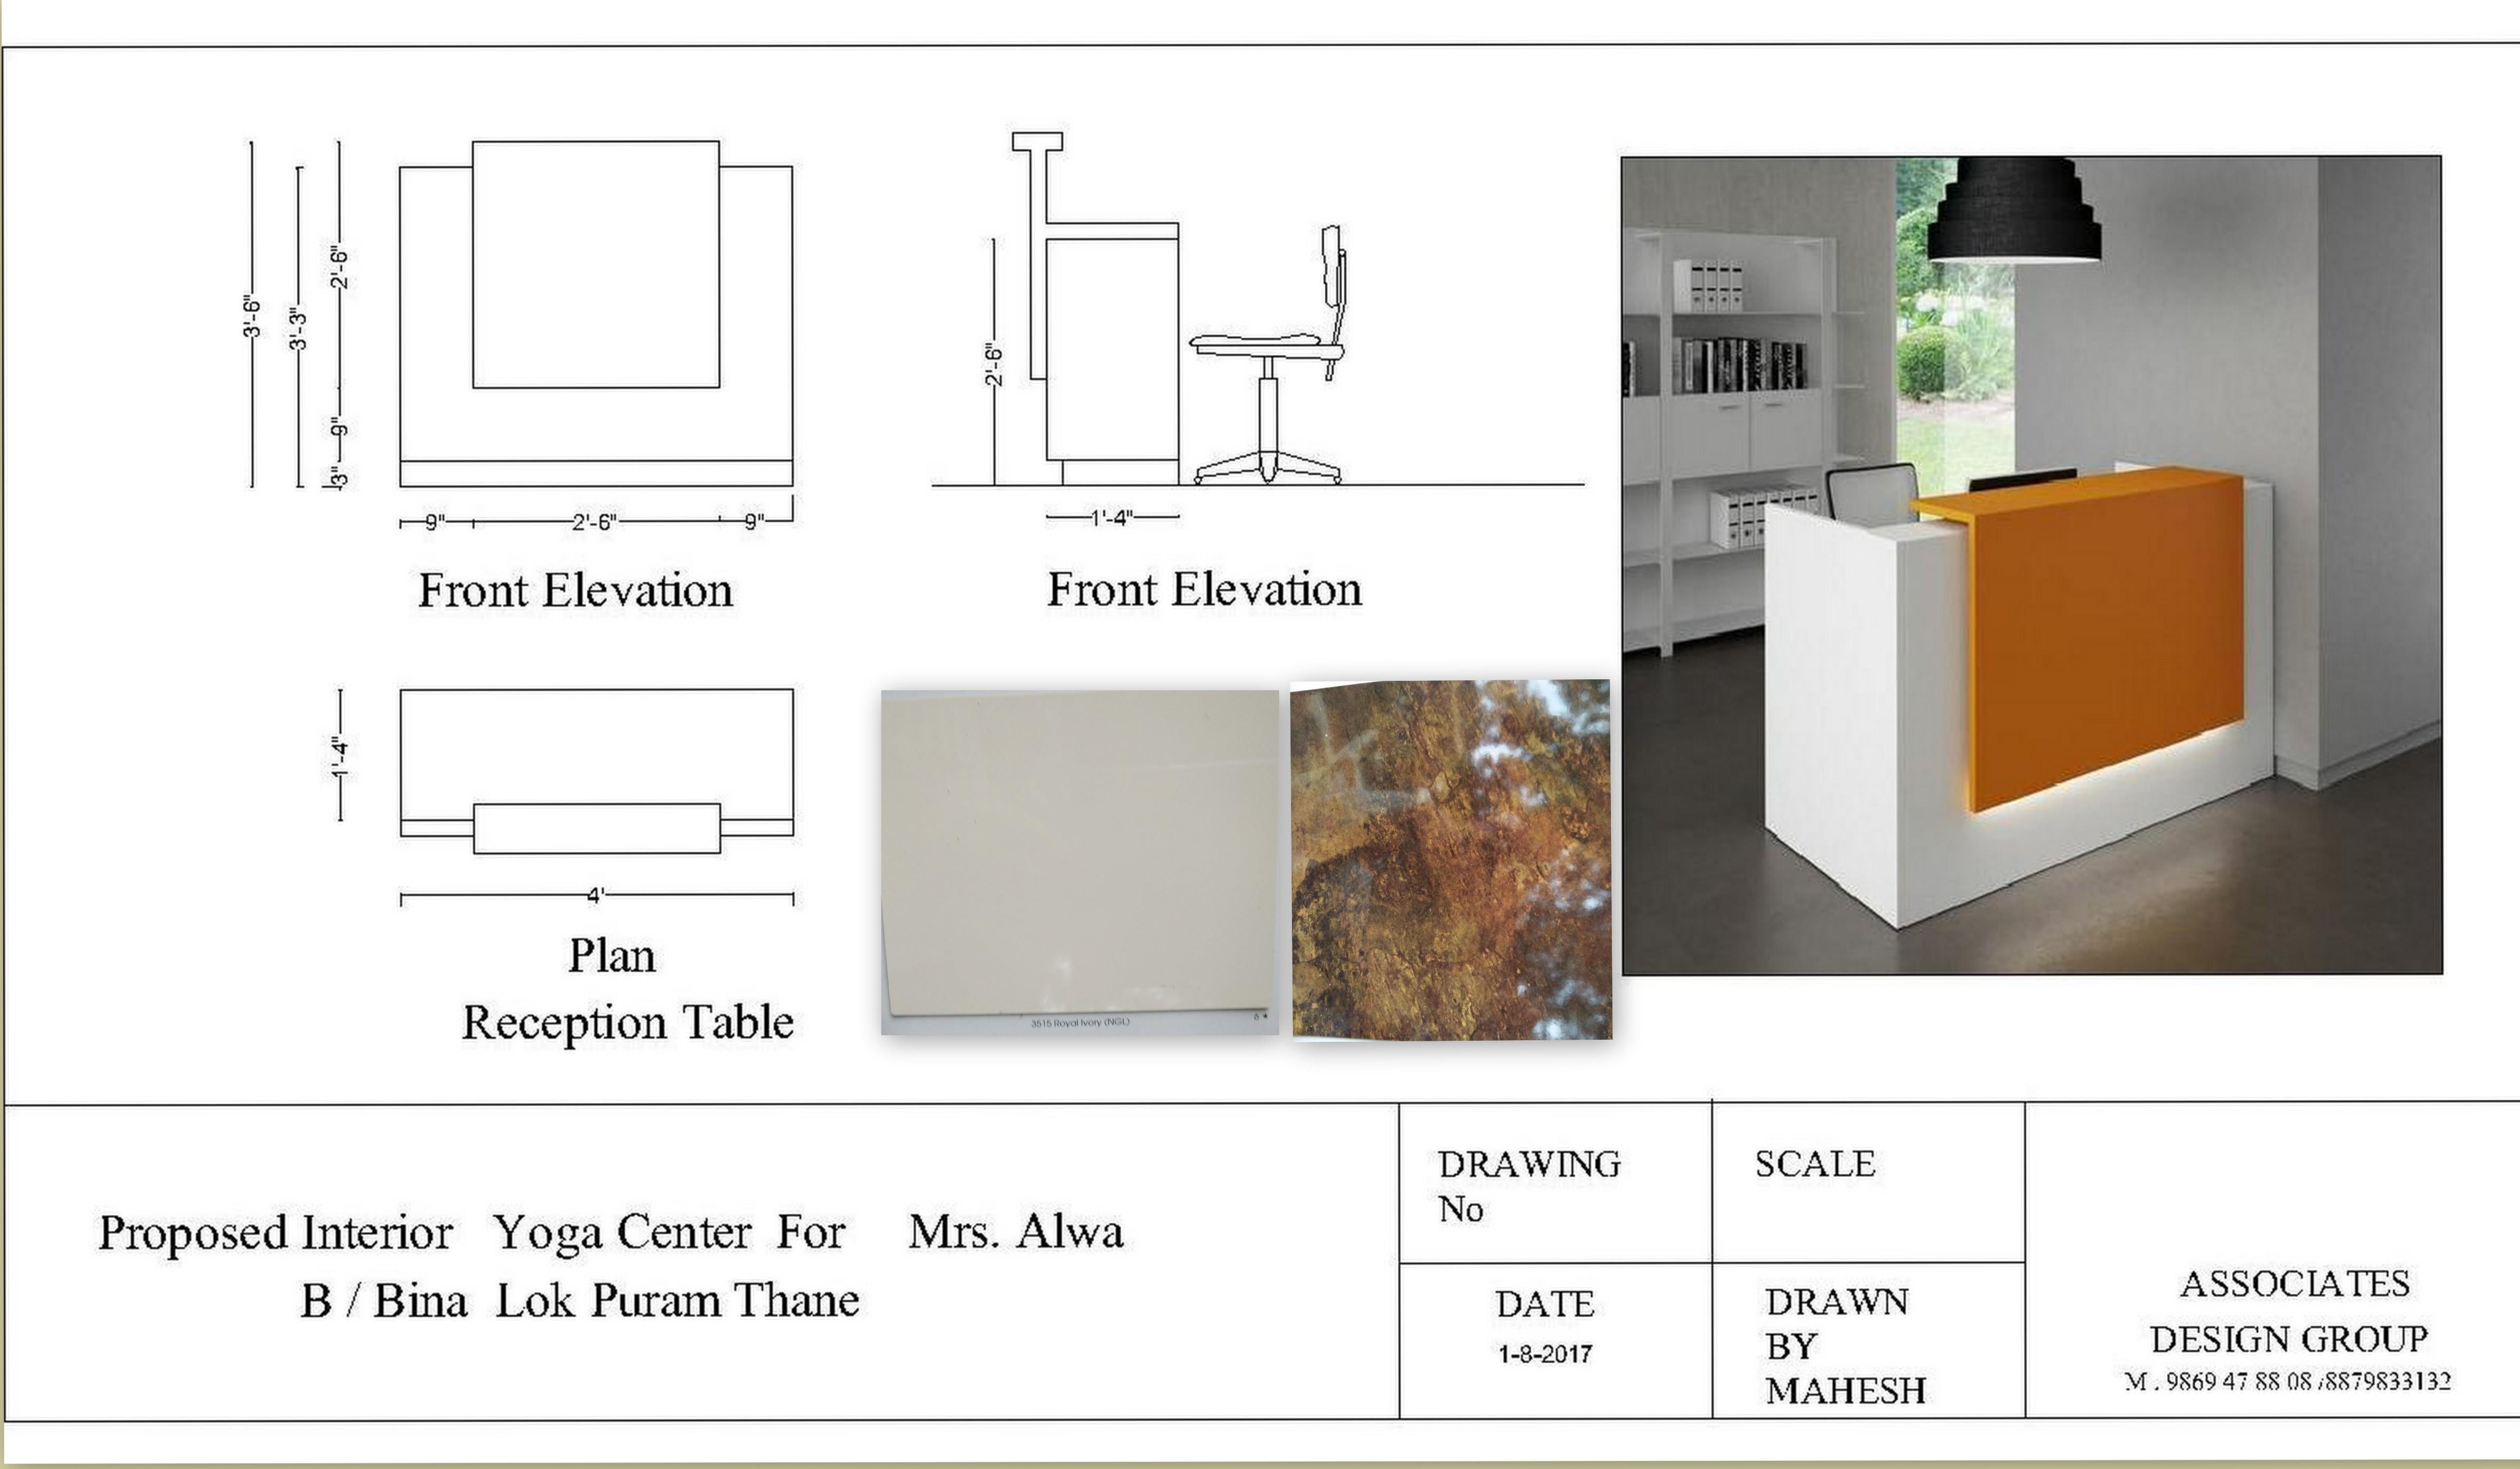 Reception Table for Yoga Center Tapovan.